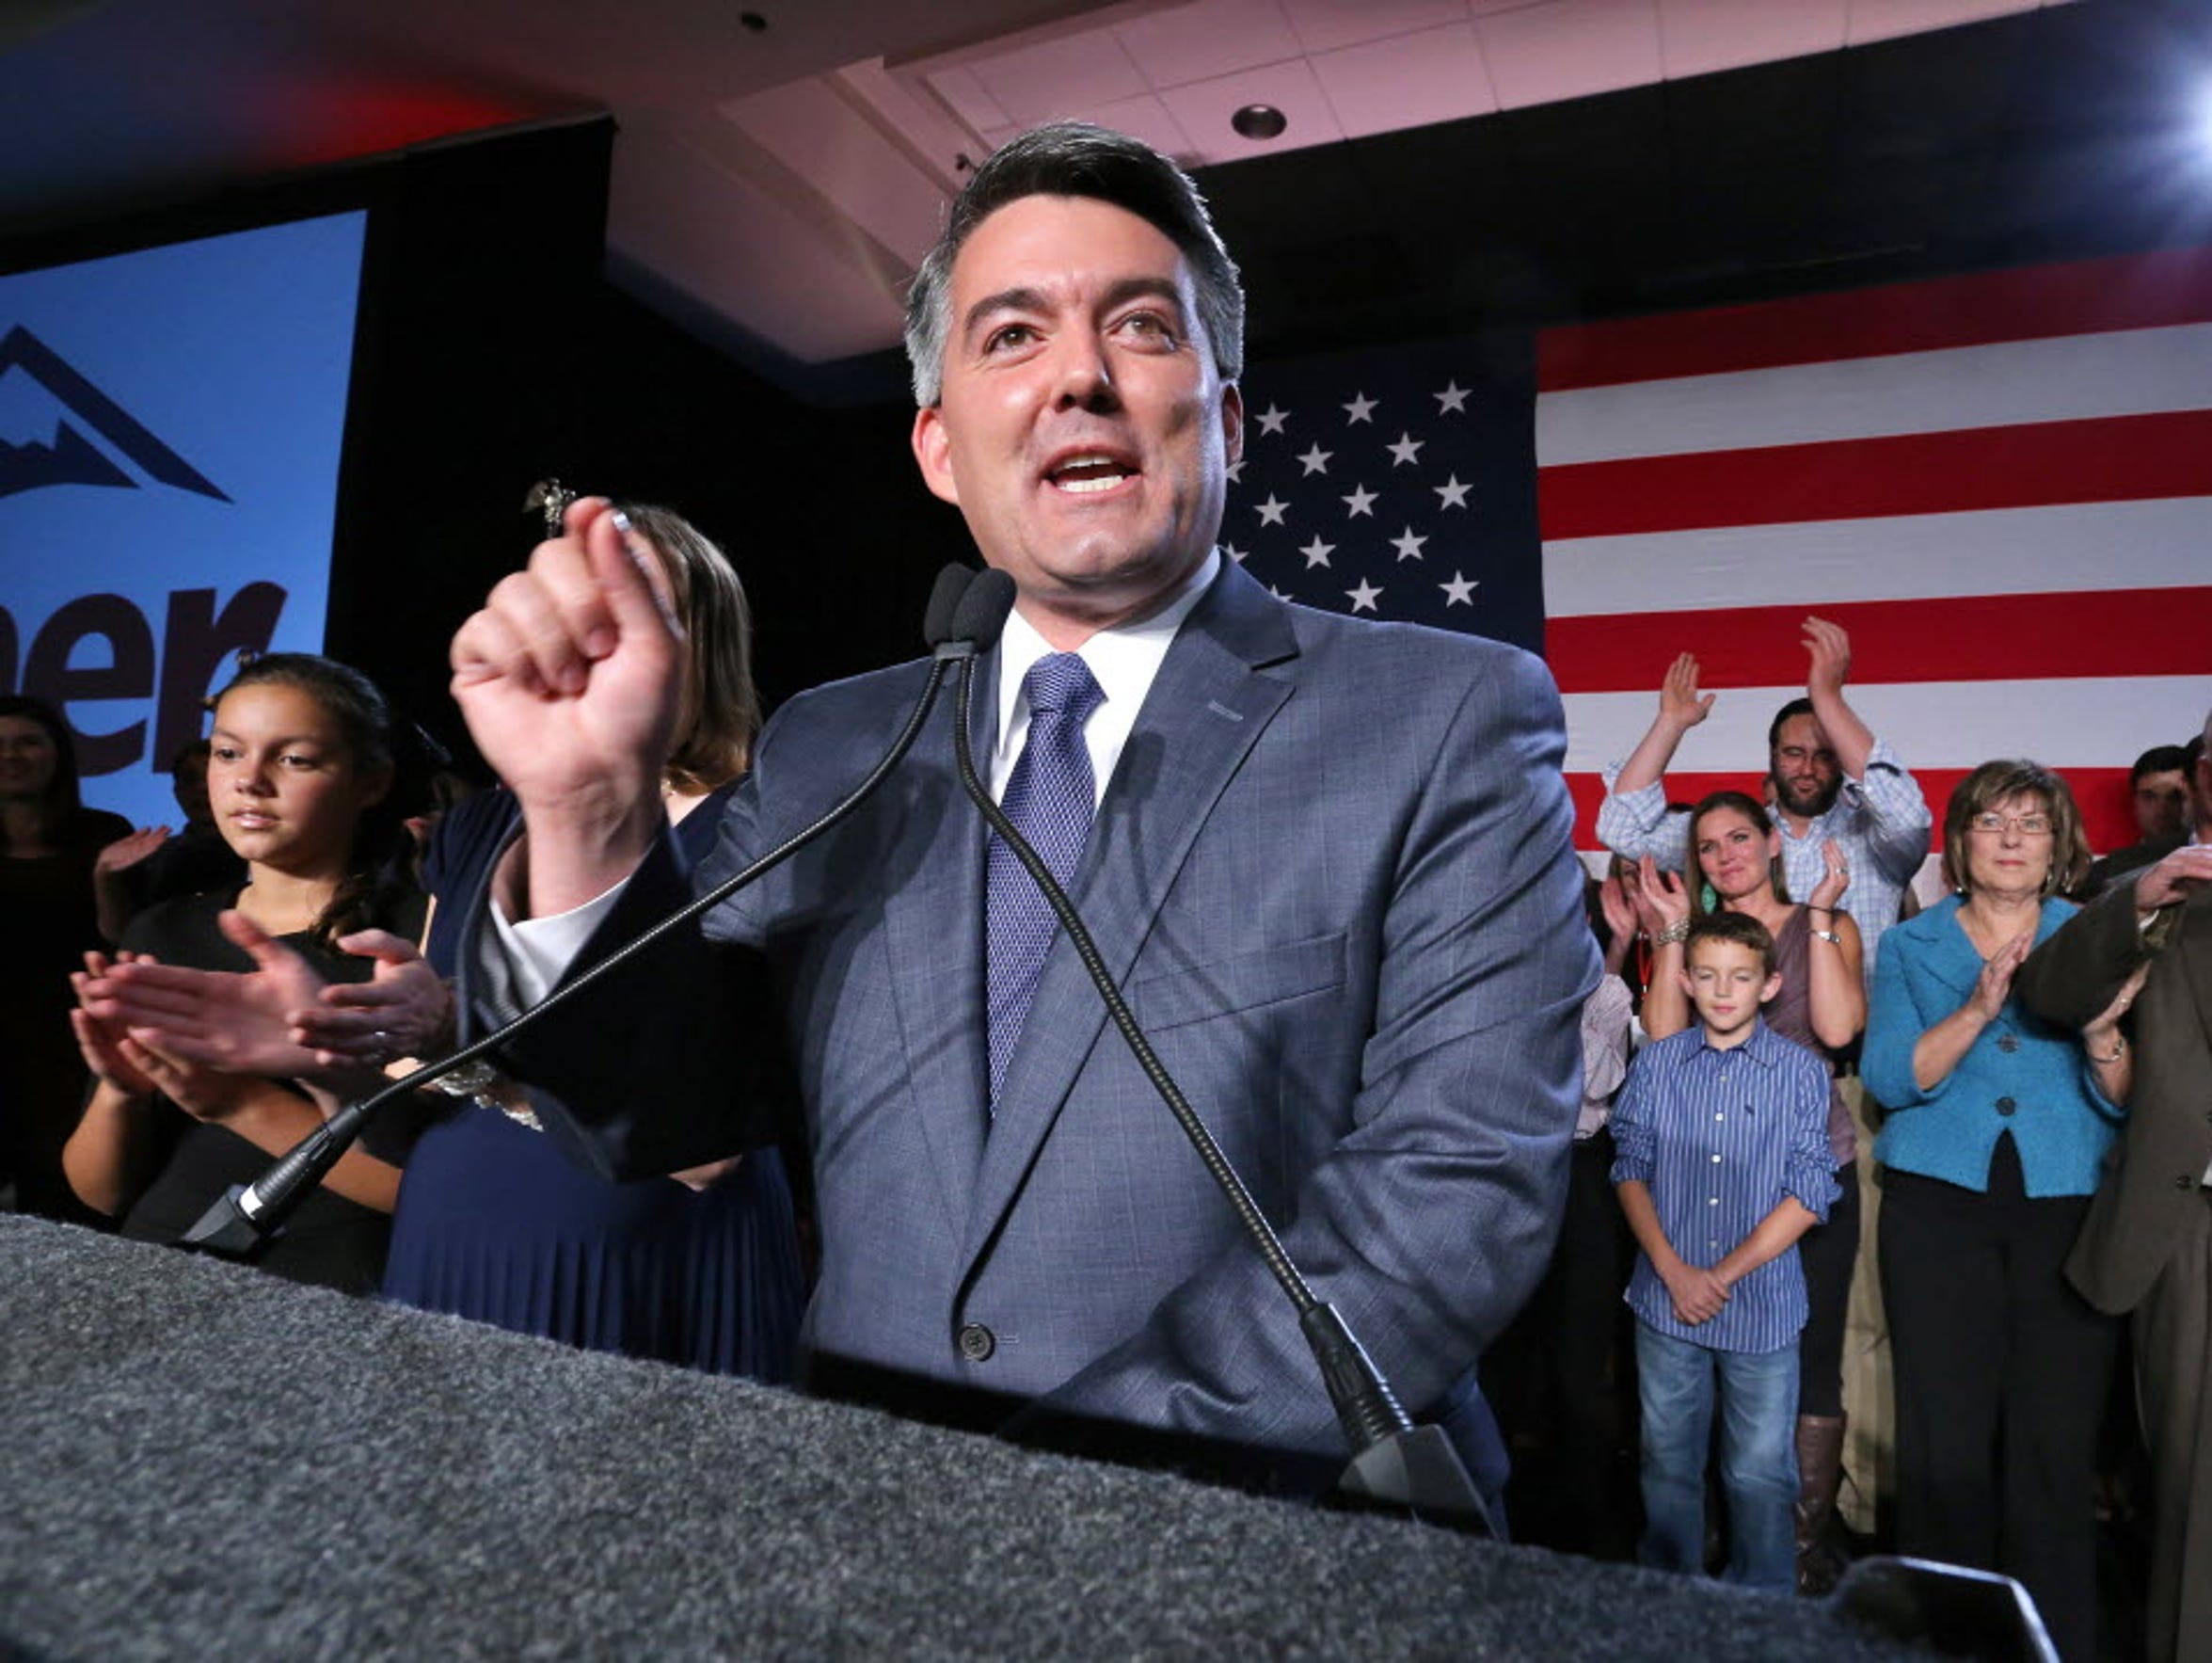 Sen.-elect Cory Gardner delivers his victory speech